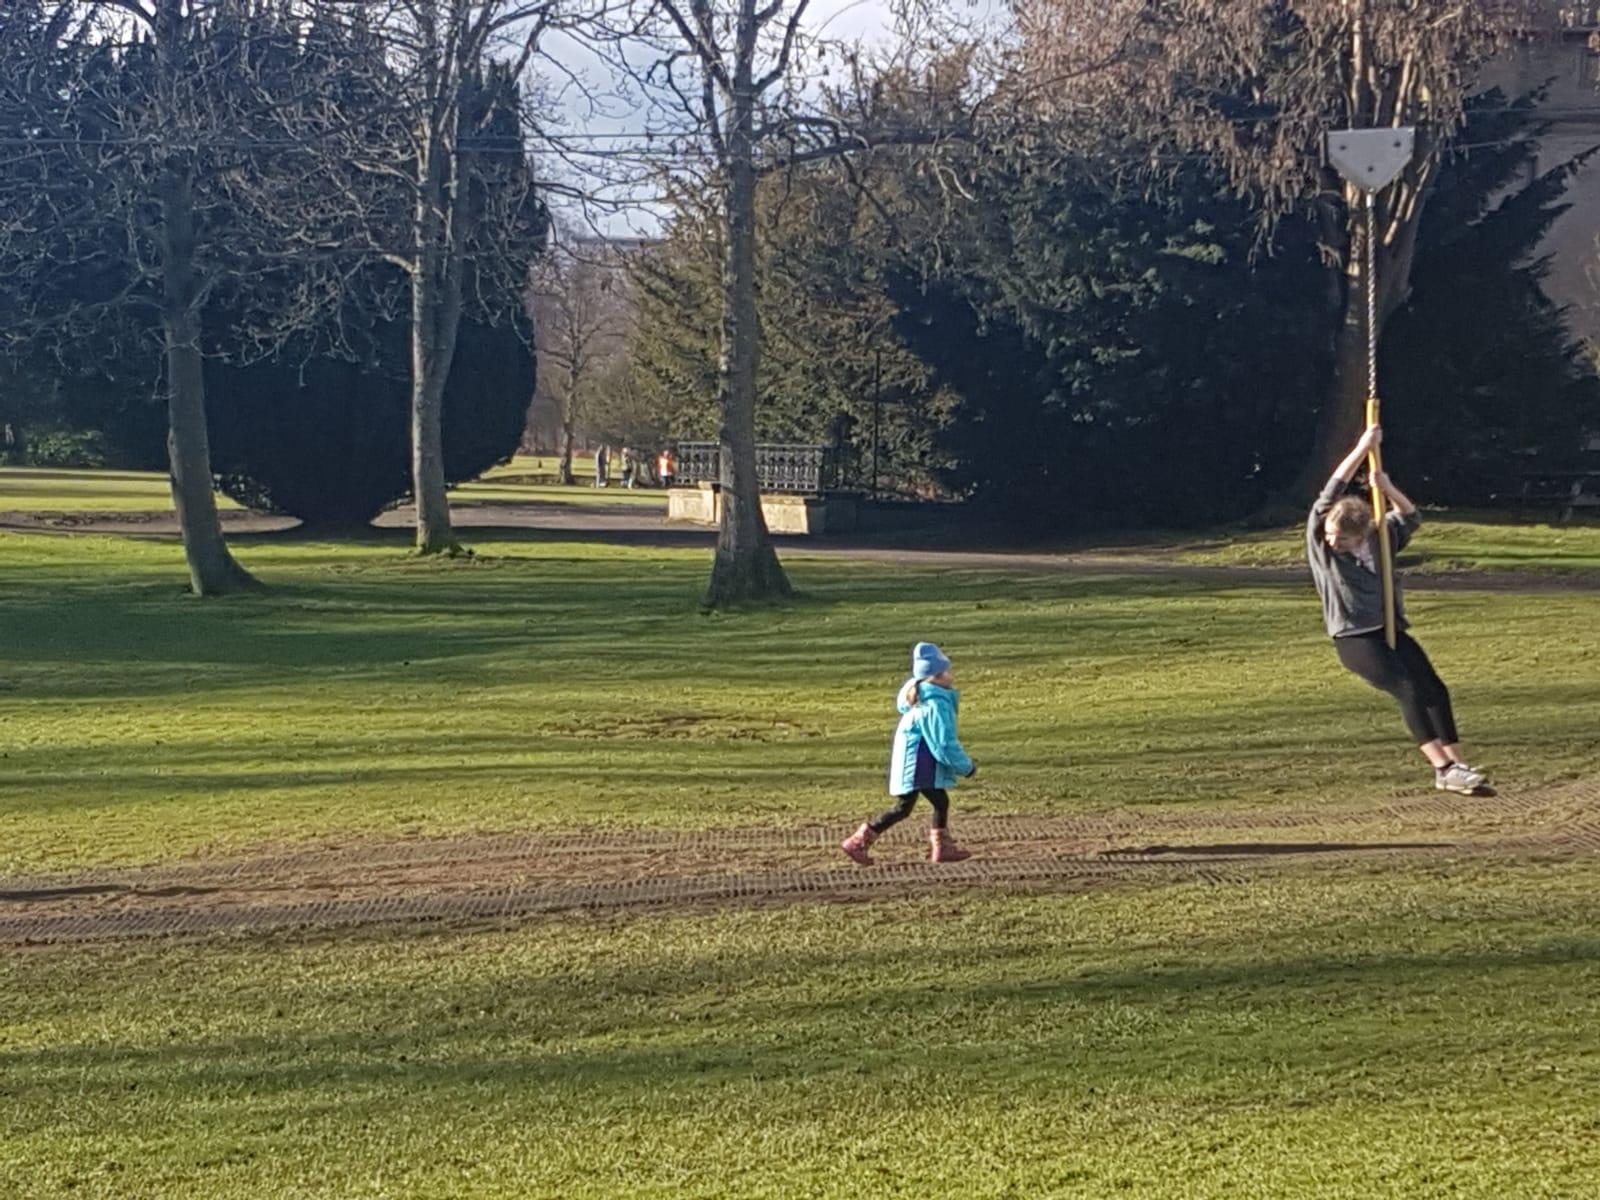 Fun at Callendar Park.